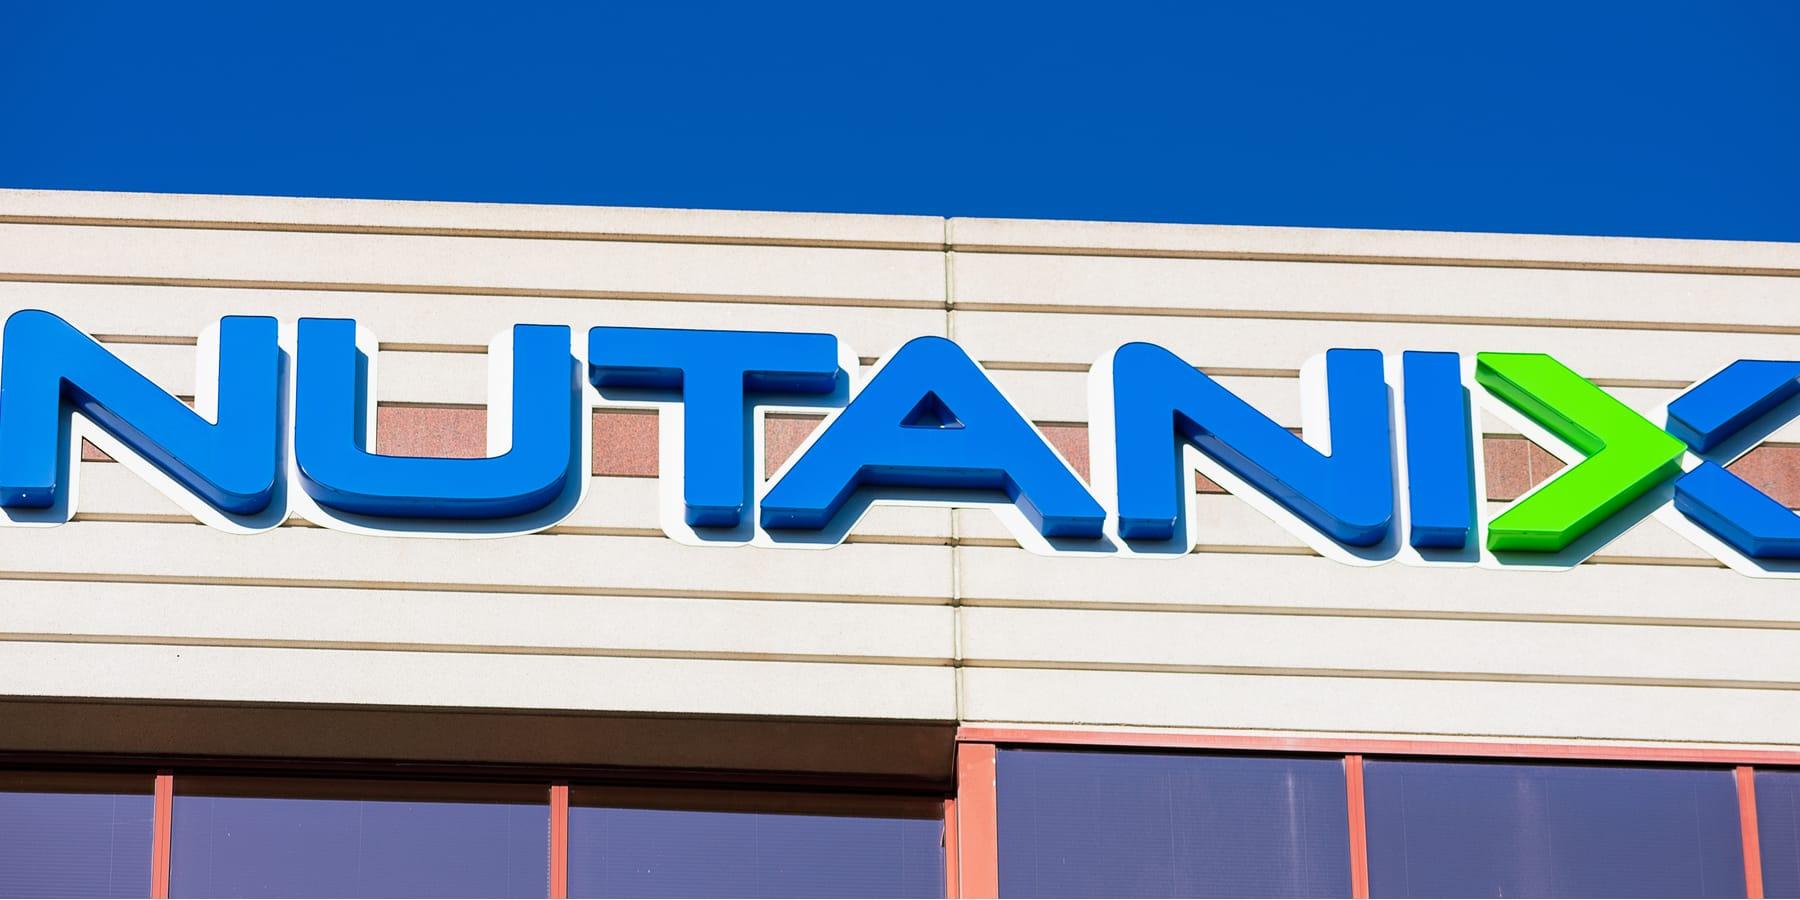 Nutanix Aktie Kurssprung nach CEO-Rückzug - Bild von Logo an Firmengebäude